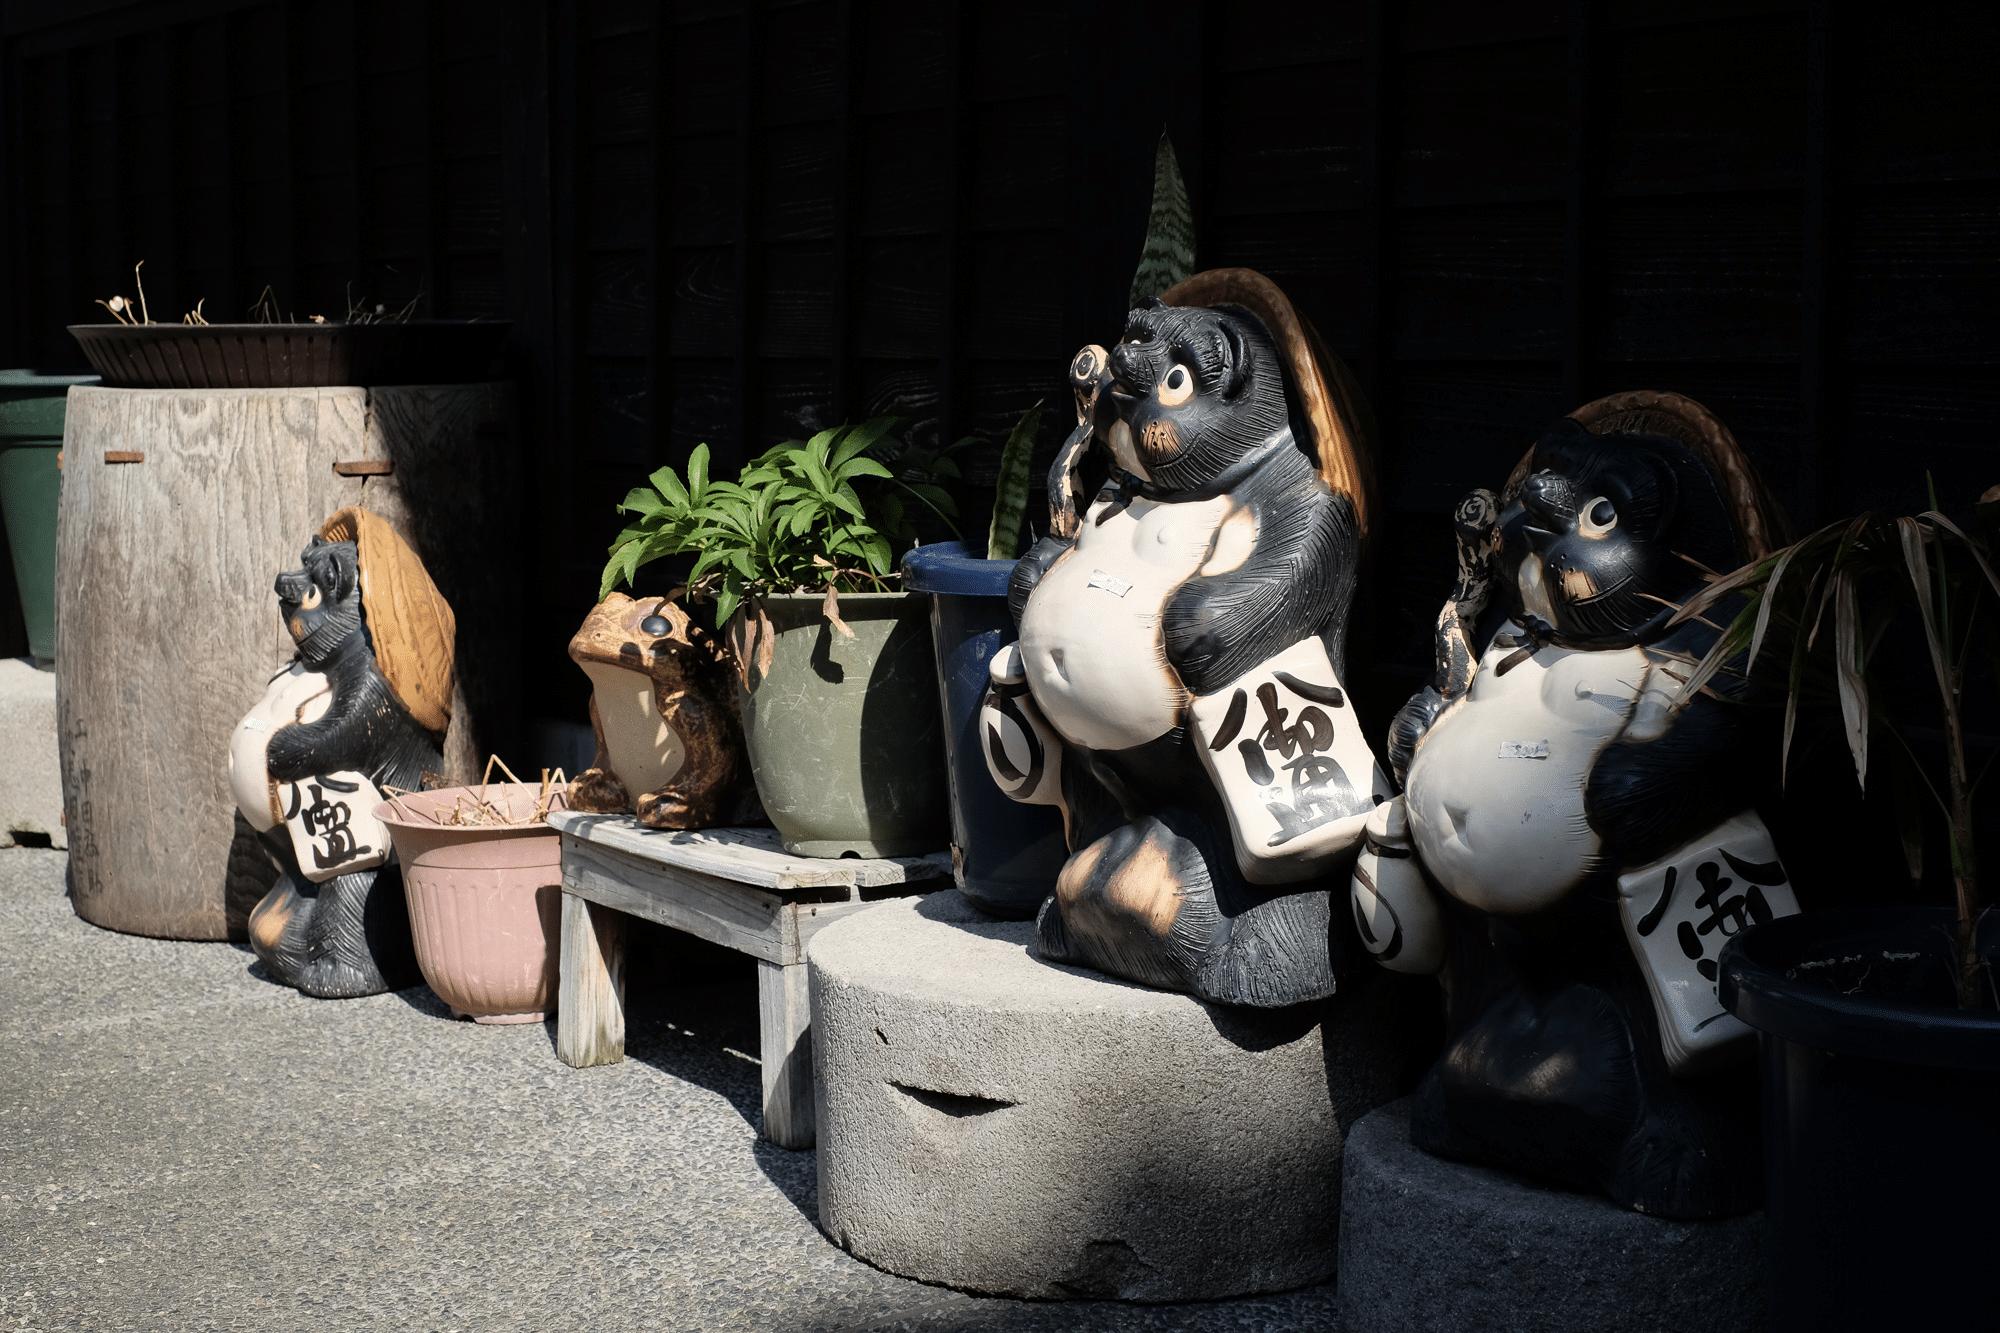 Tanukis à Takayama